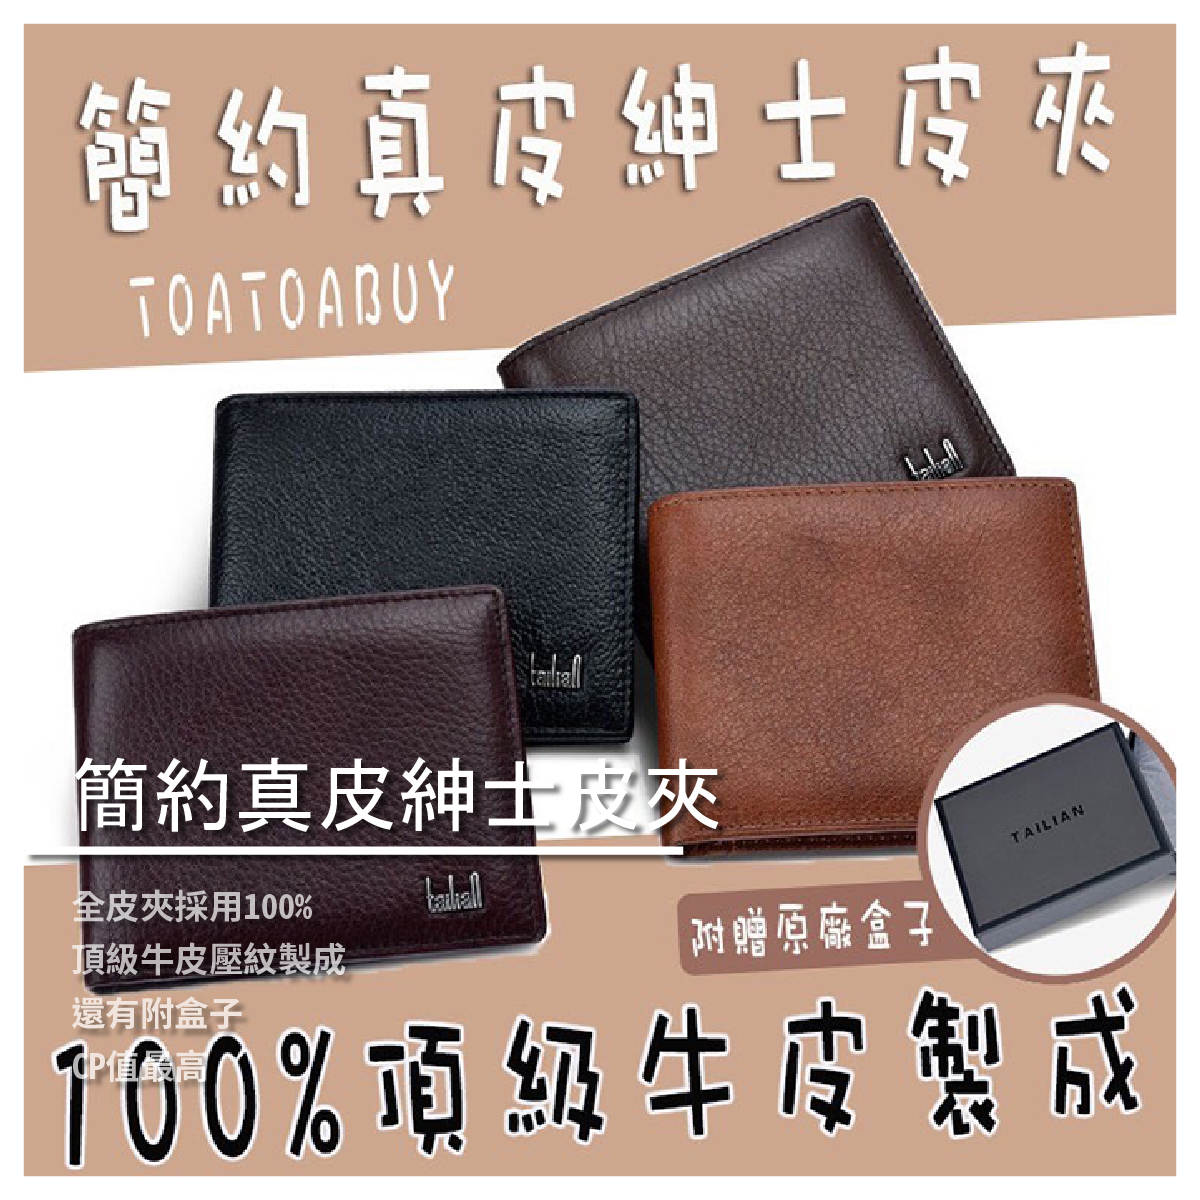 【TOATOABUY 托托買】簡約真皮紳士皮夾/9.4X11.7X1.5cm